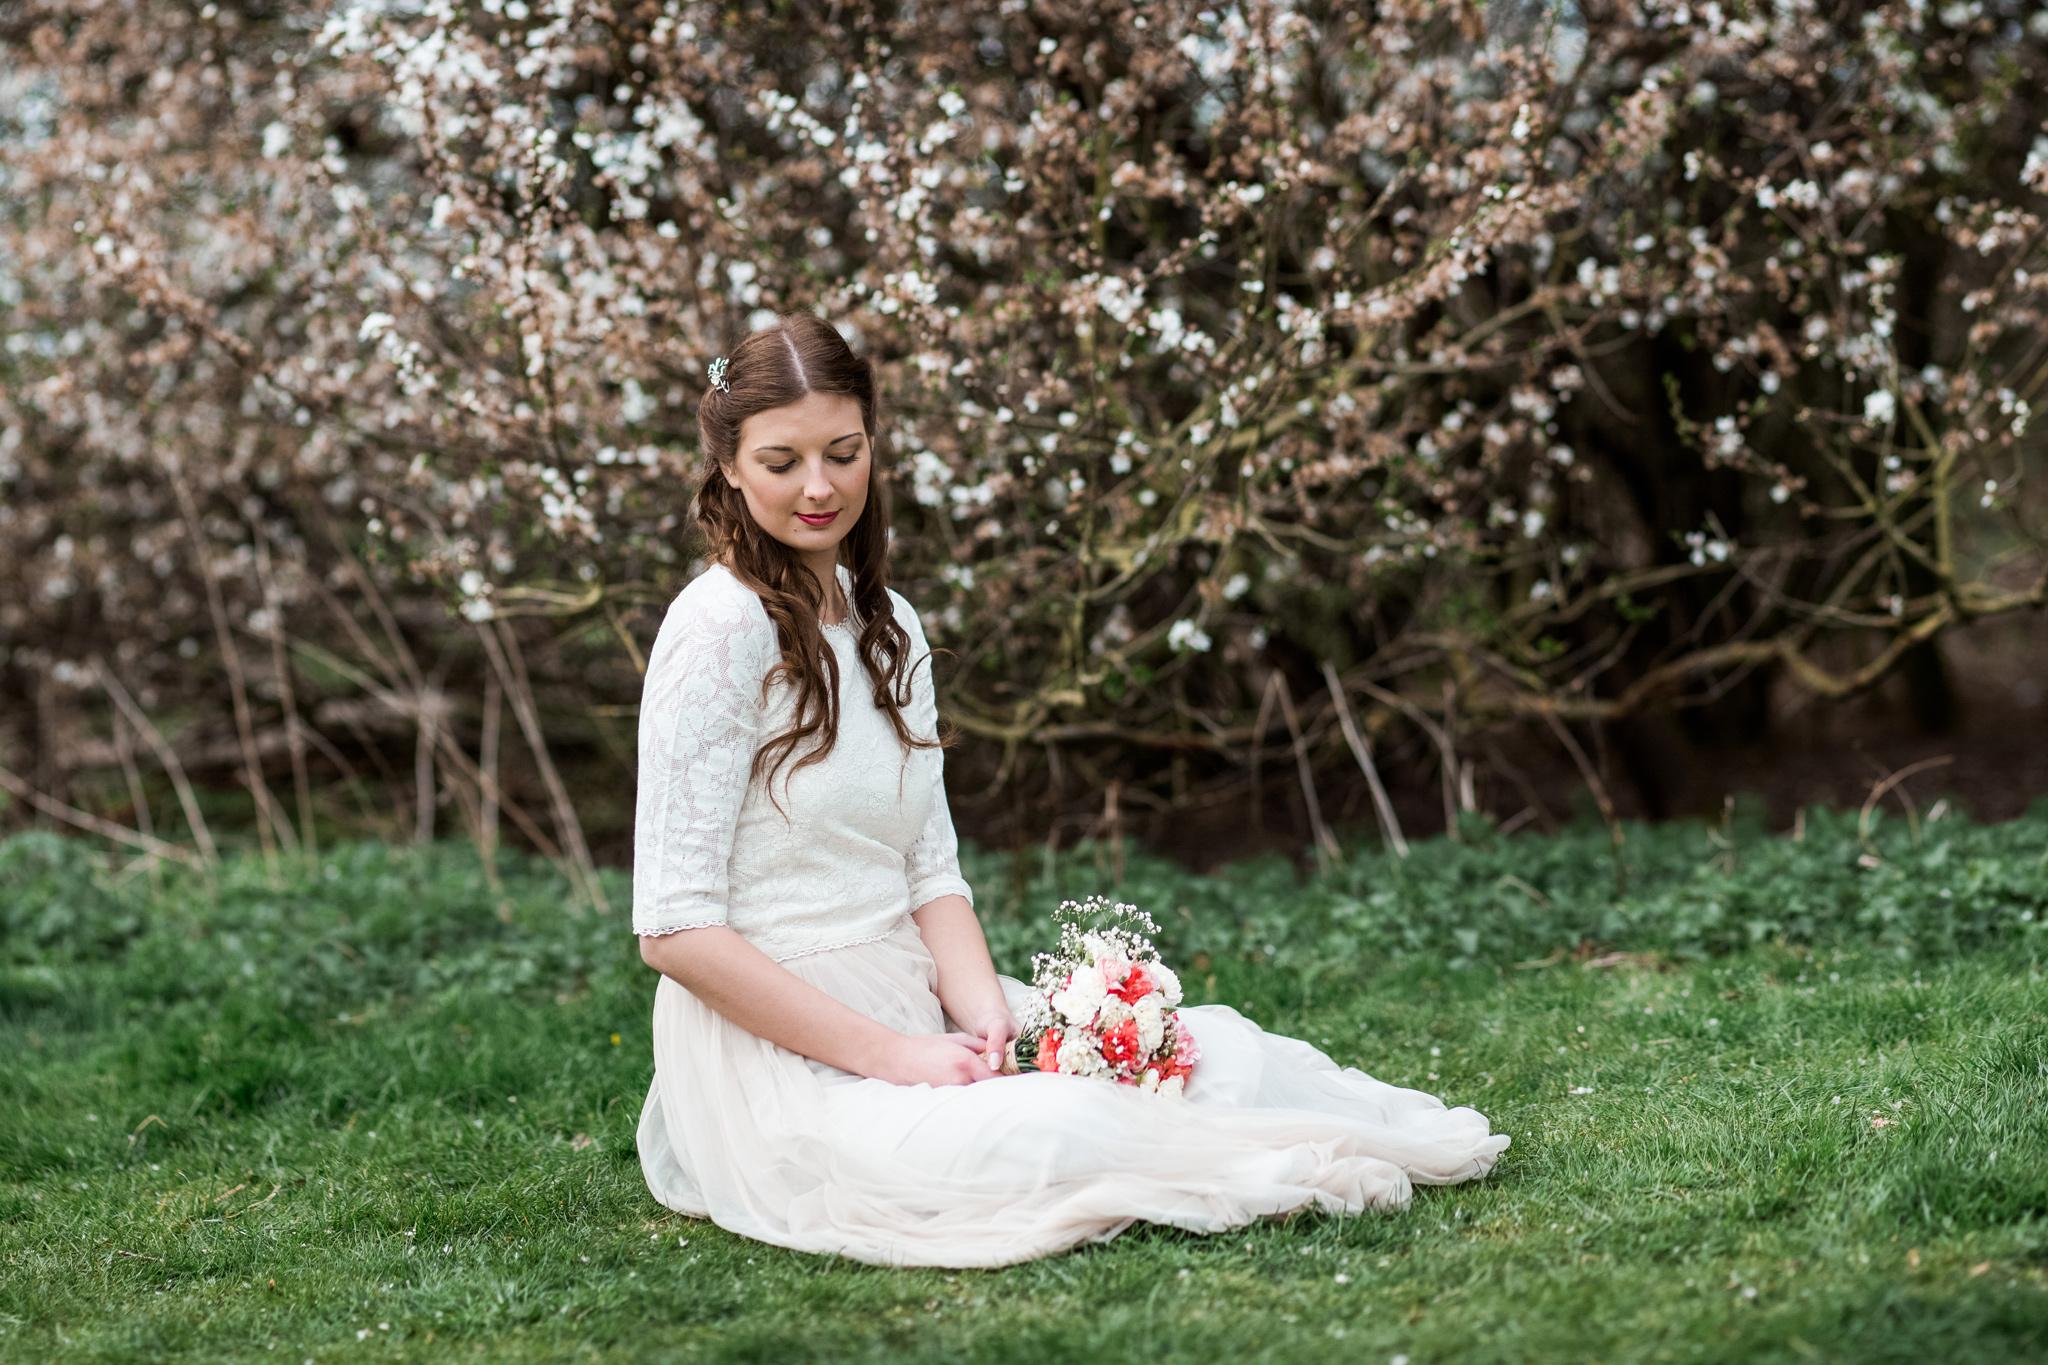 styled-wedding-bridal-shoot-blossom-10